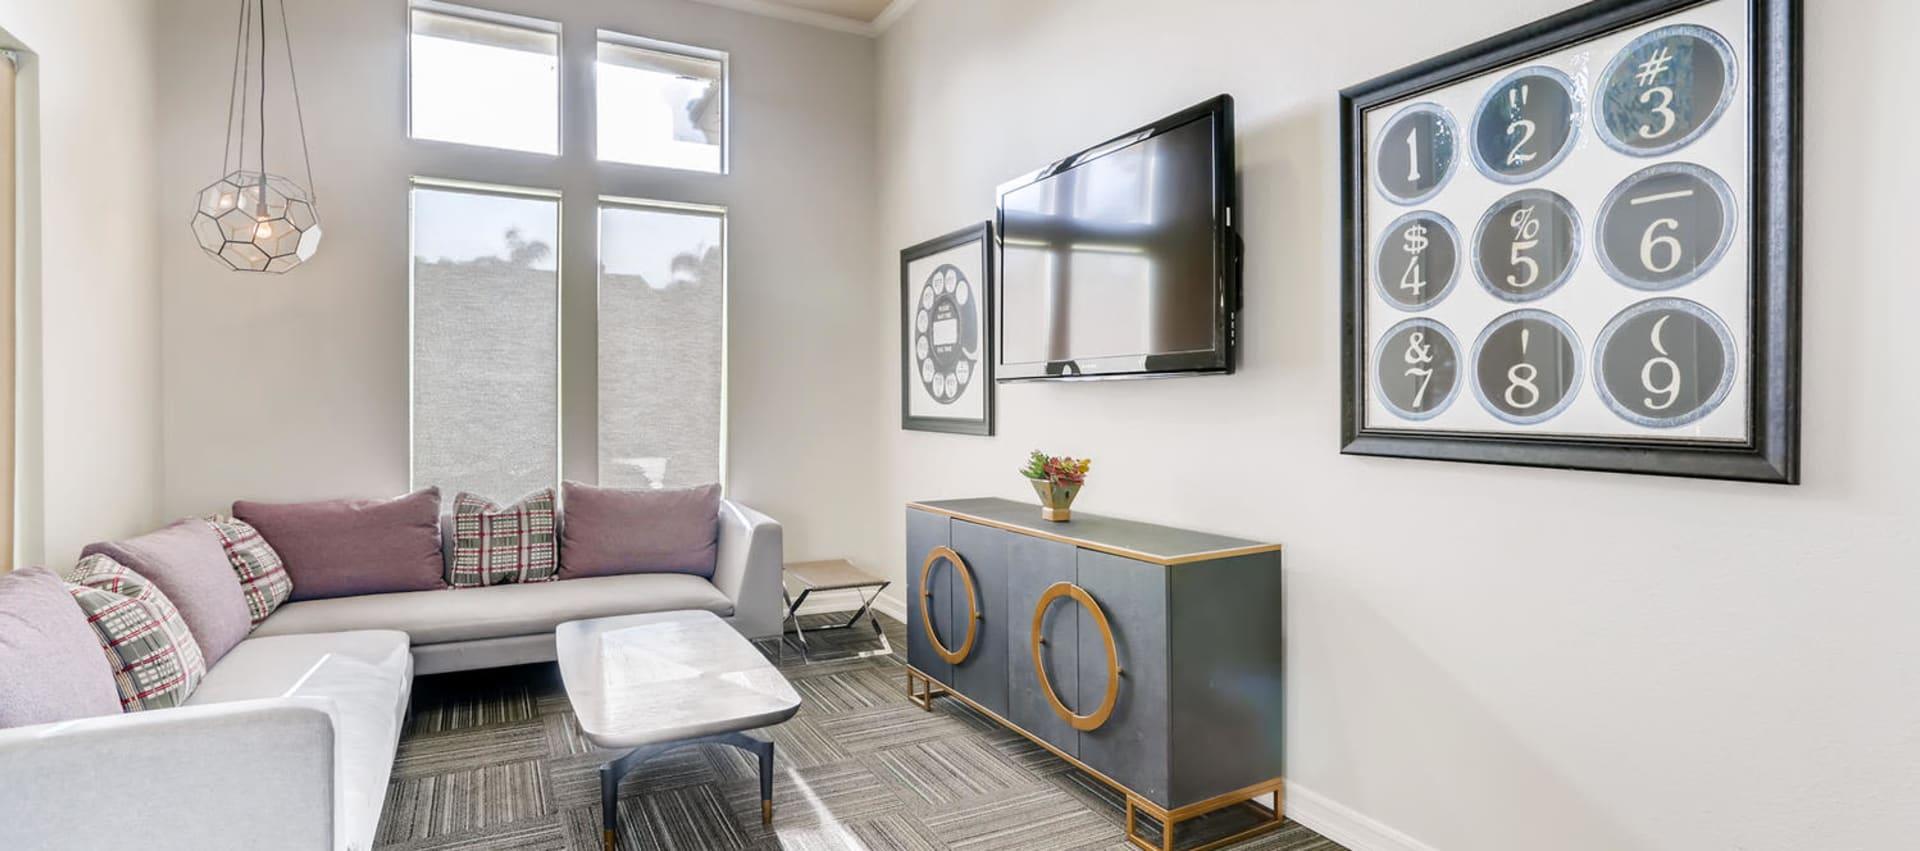 lounge at Alize at Aliso Viejo Apartment Homes in Aliso Viejo, California